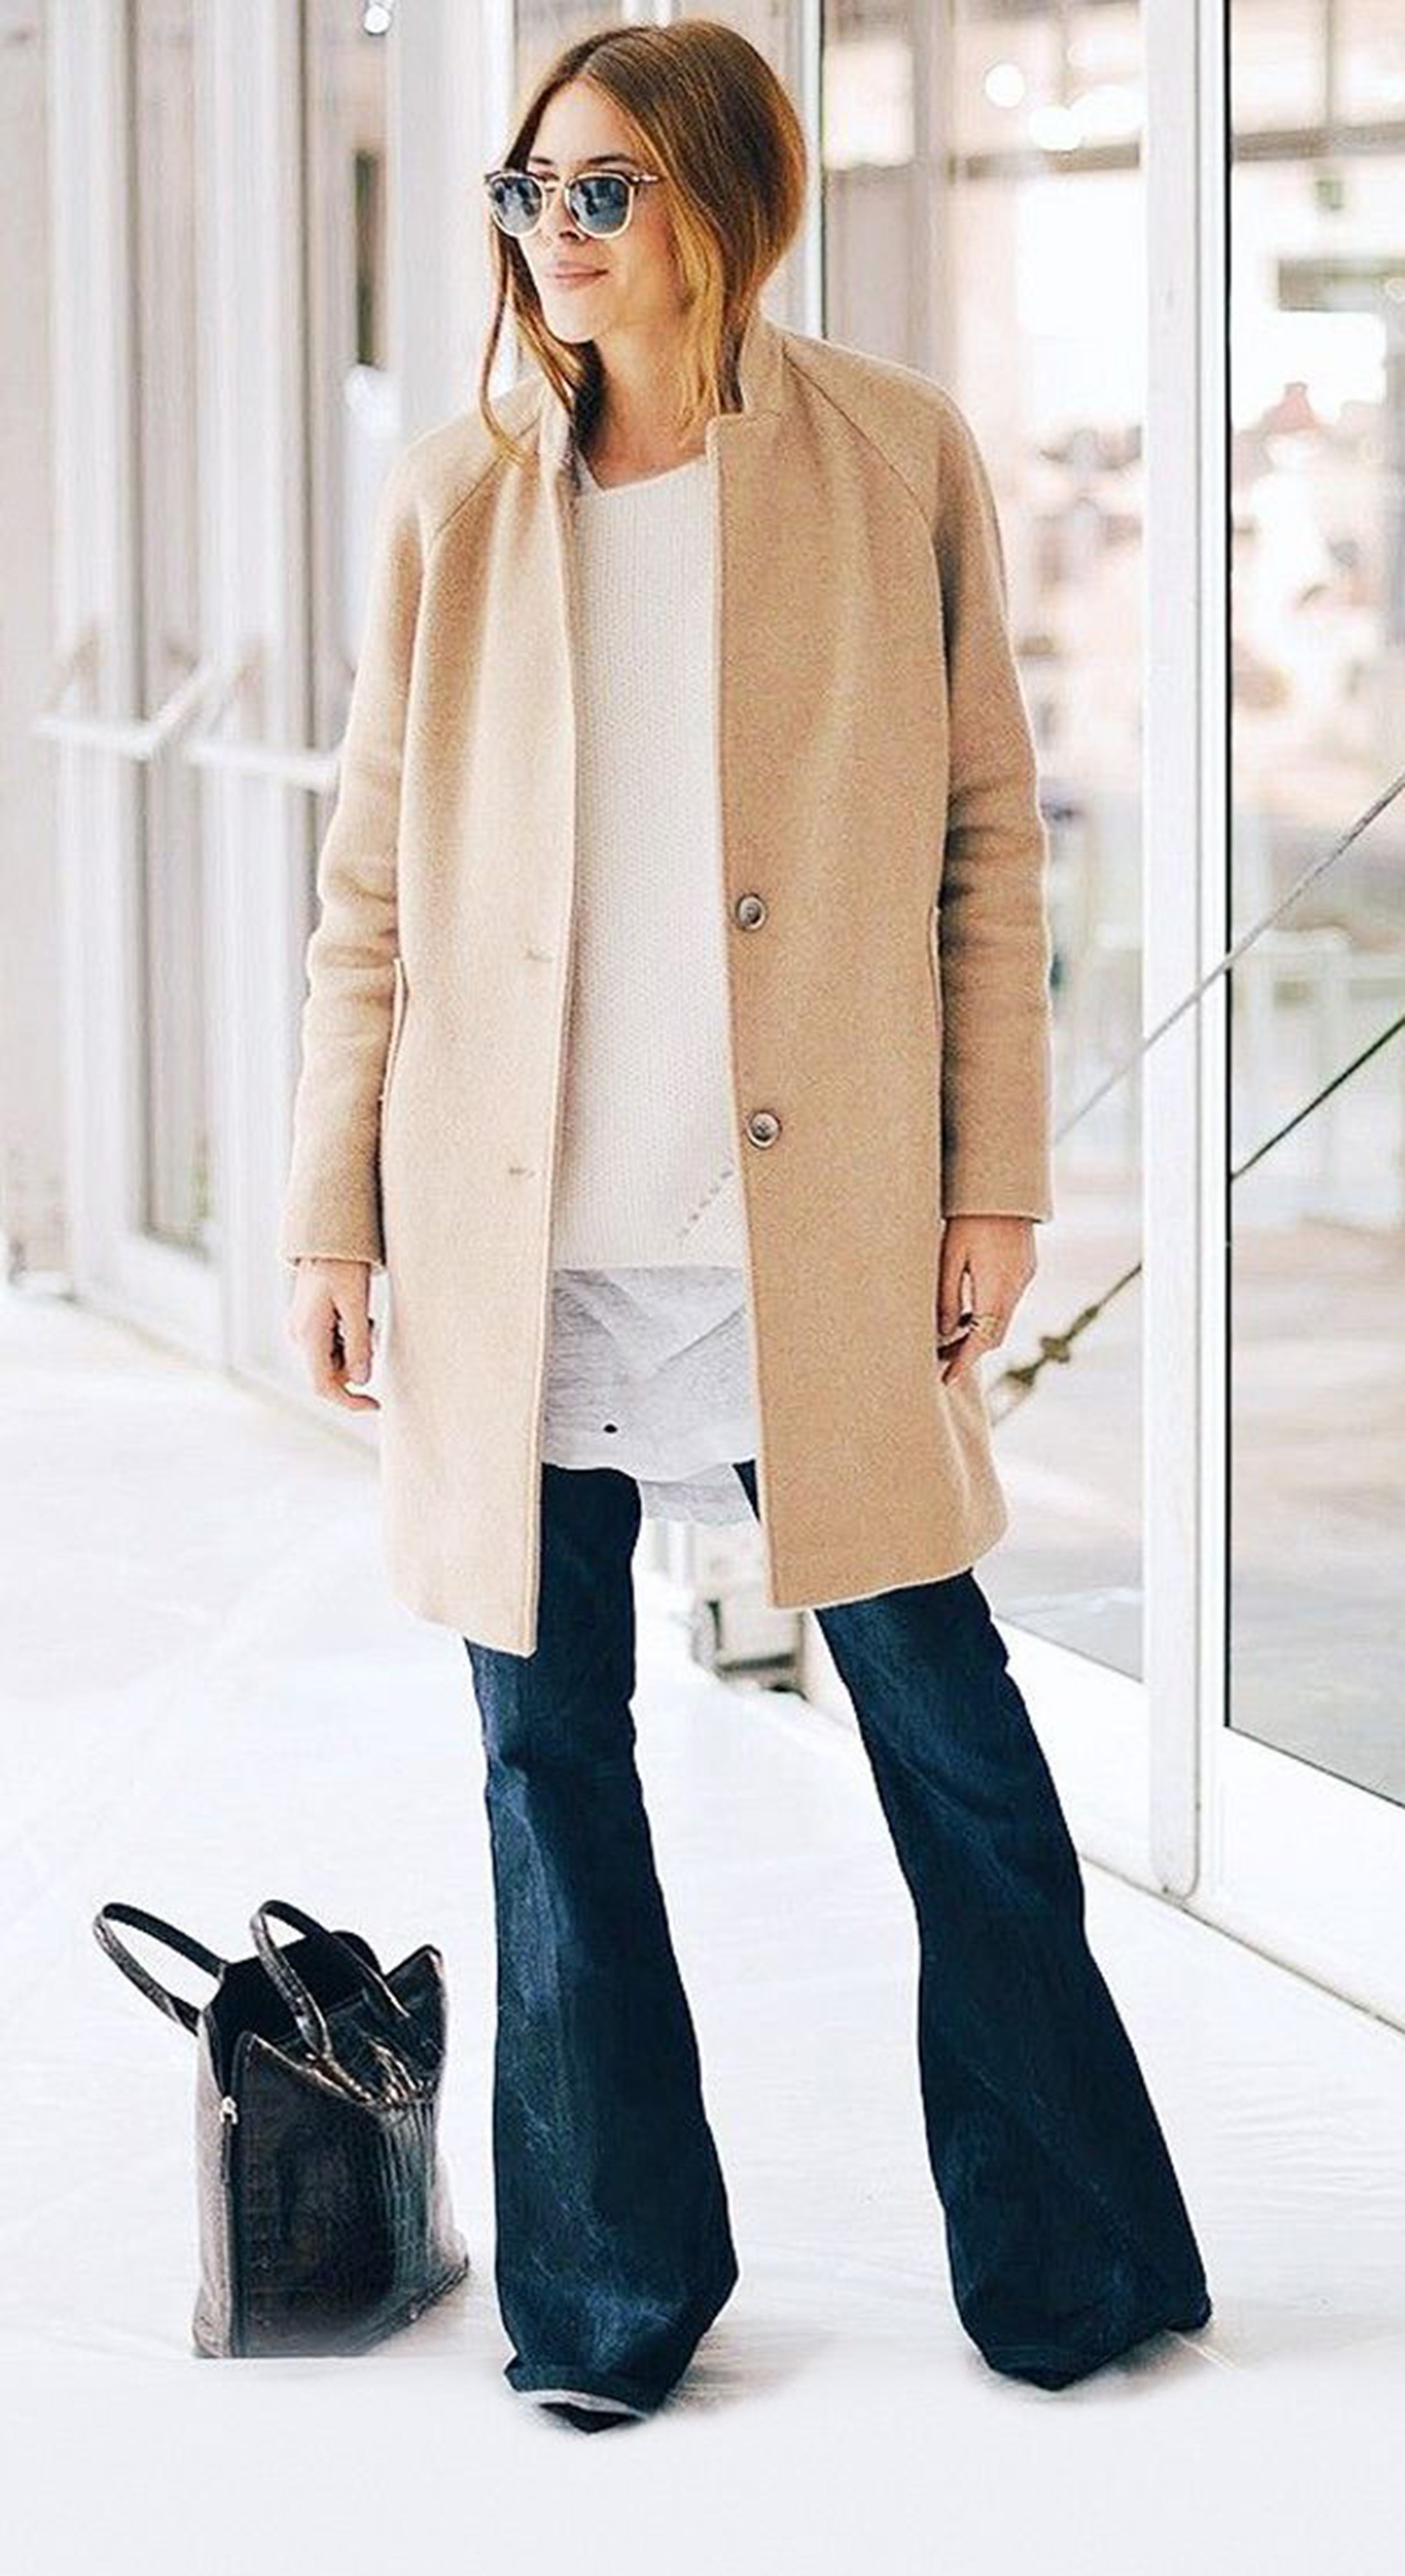 pantaloni-zampa-styleshouts-hollywood-style-flared-jeans-black-color-mantella-shirt-crop-top-fashion-trend-cream